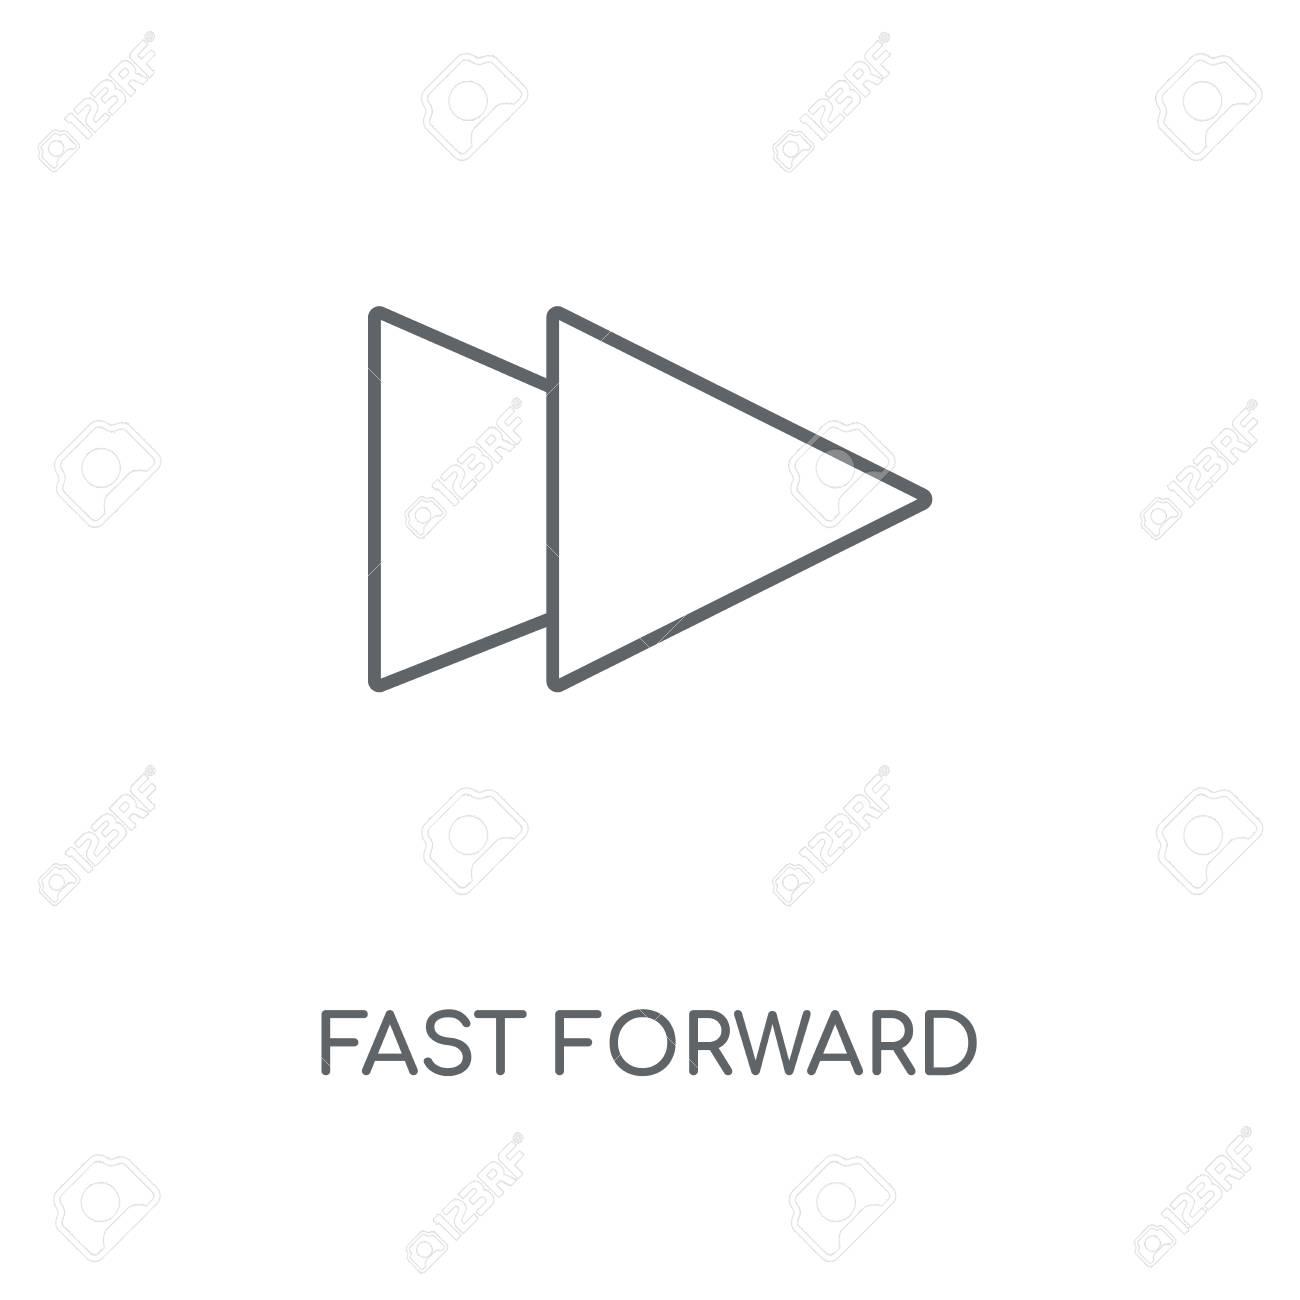 The Forward Concept